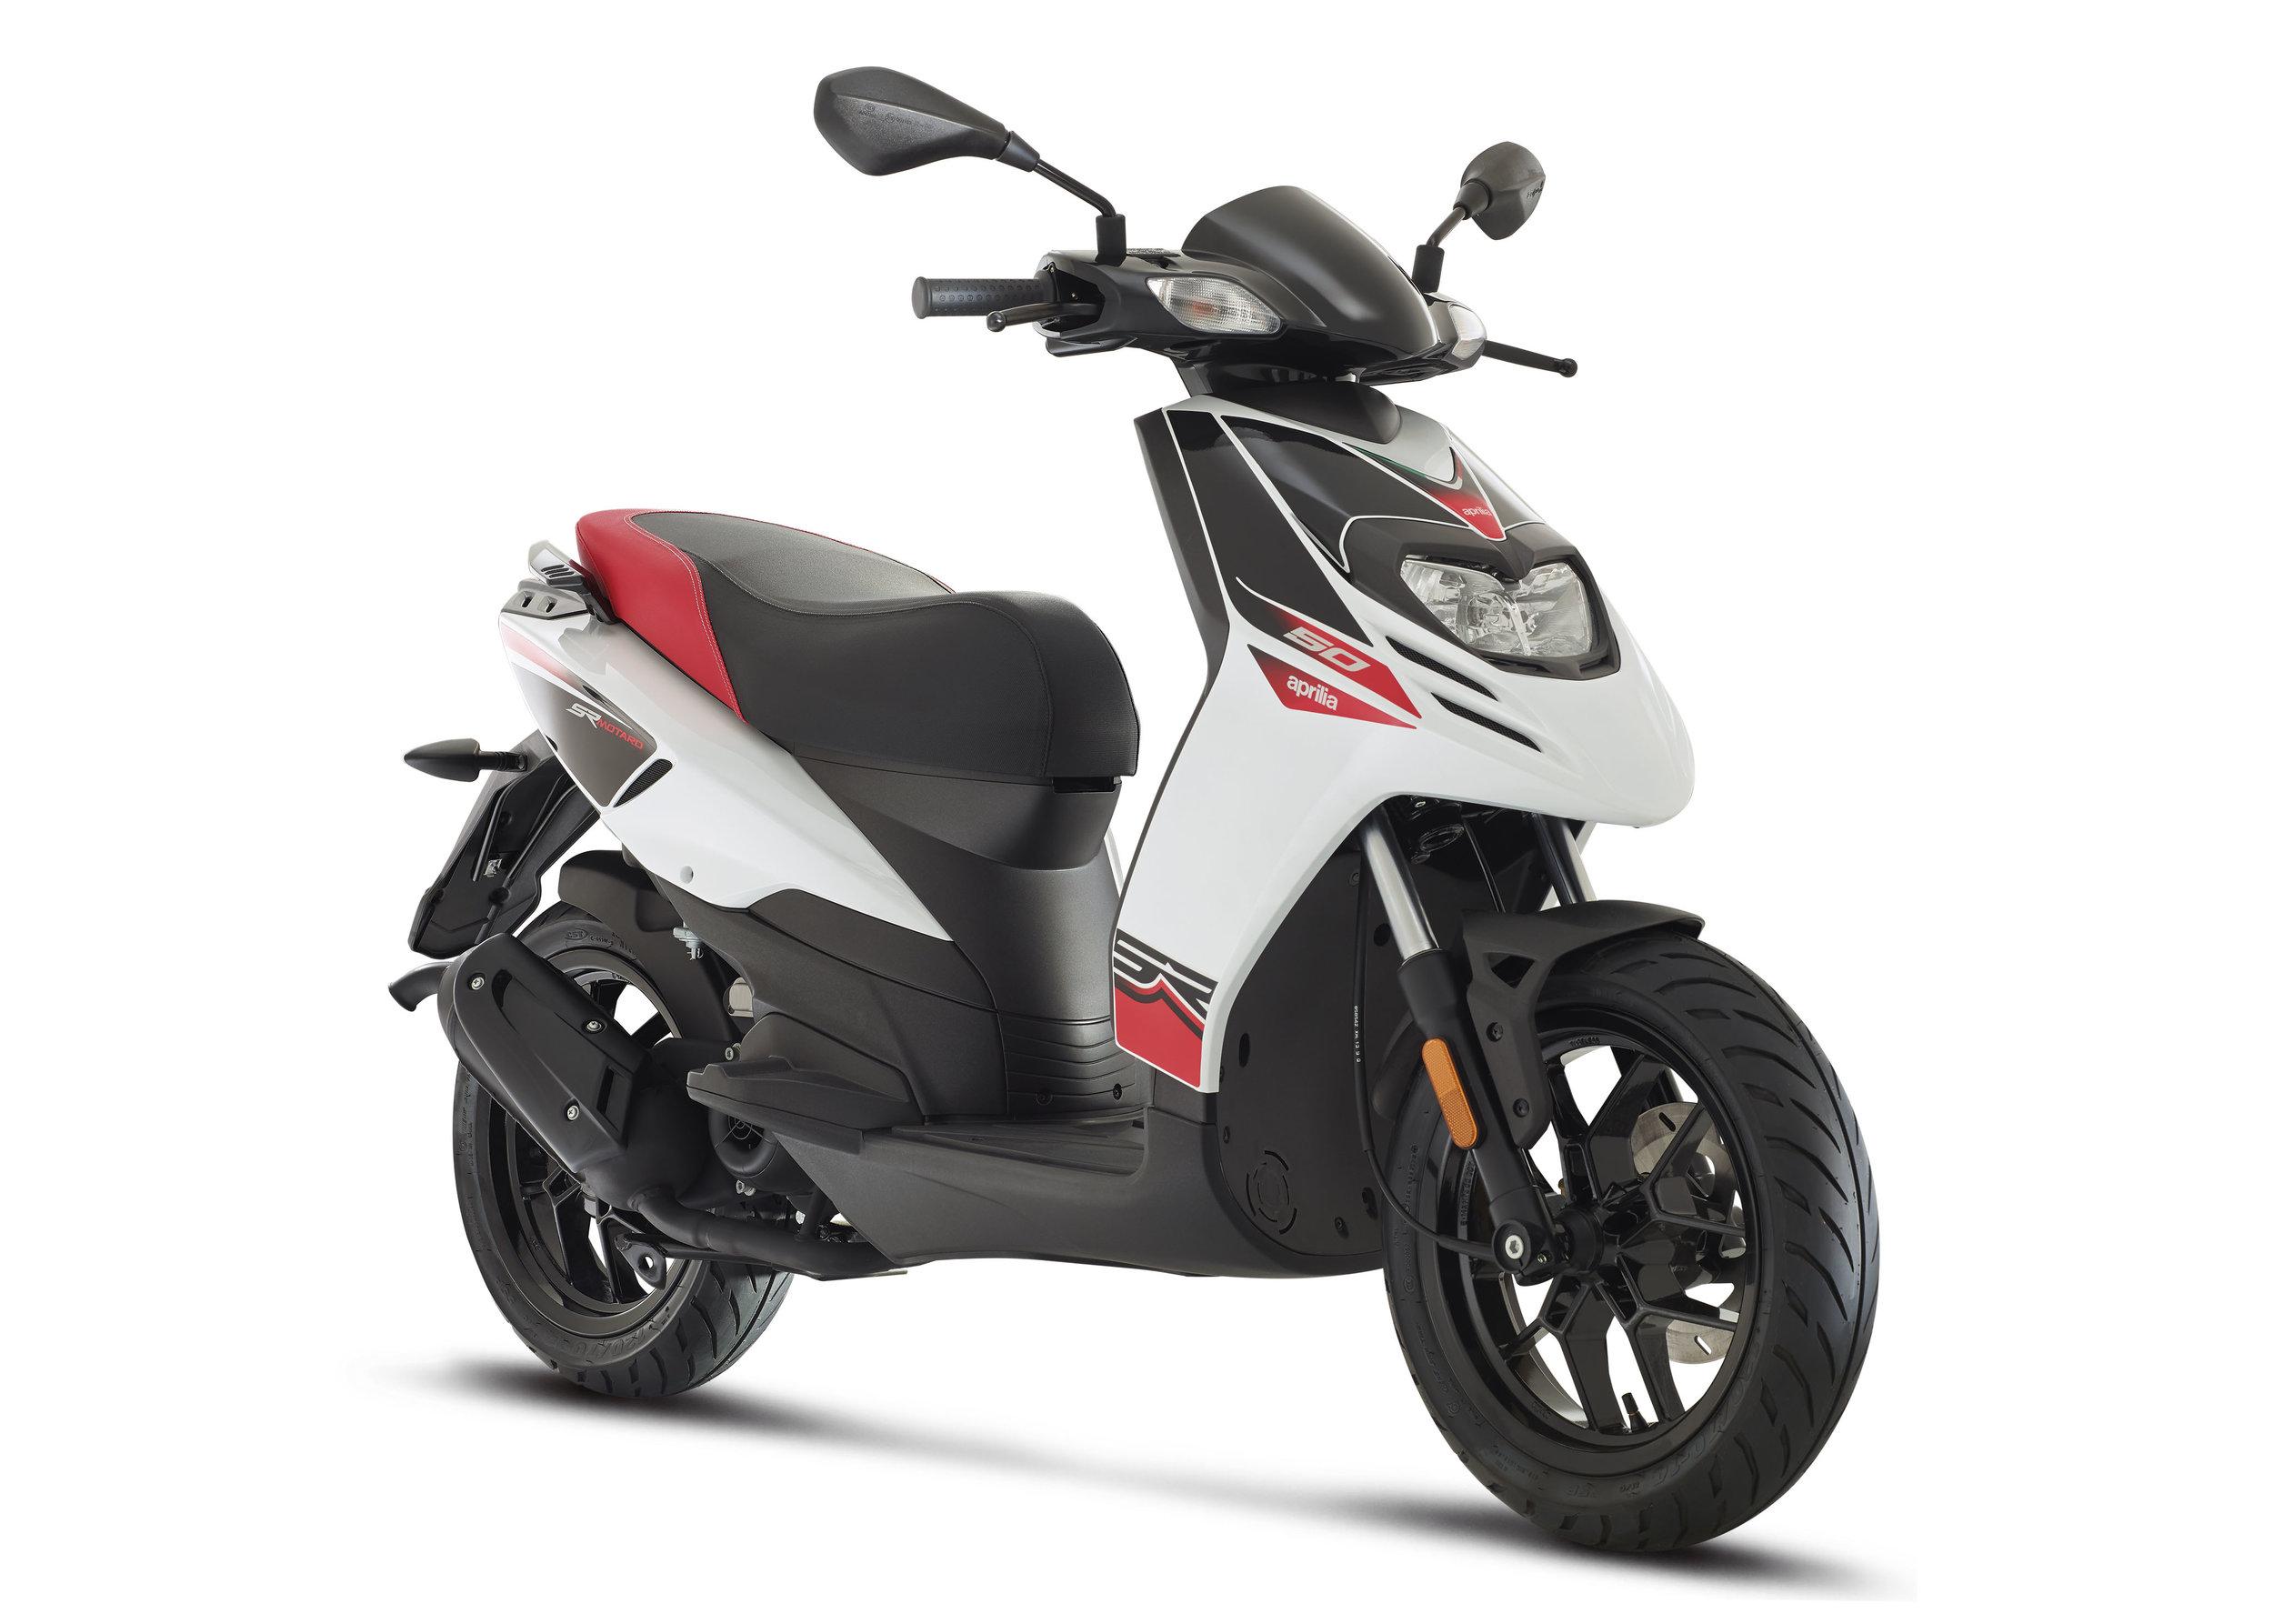 Aprilia SR MOTARD 50 - 50cc14'' Wheels220mm Front Disc BrakesLCD Display